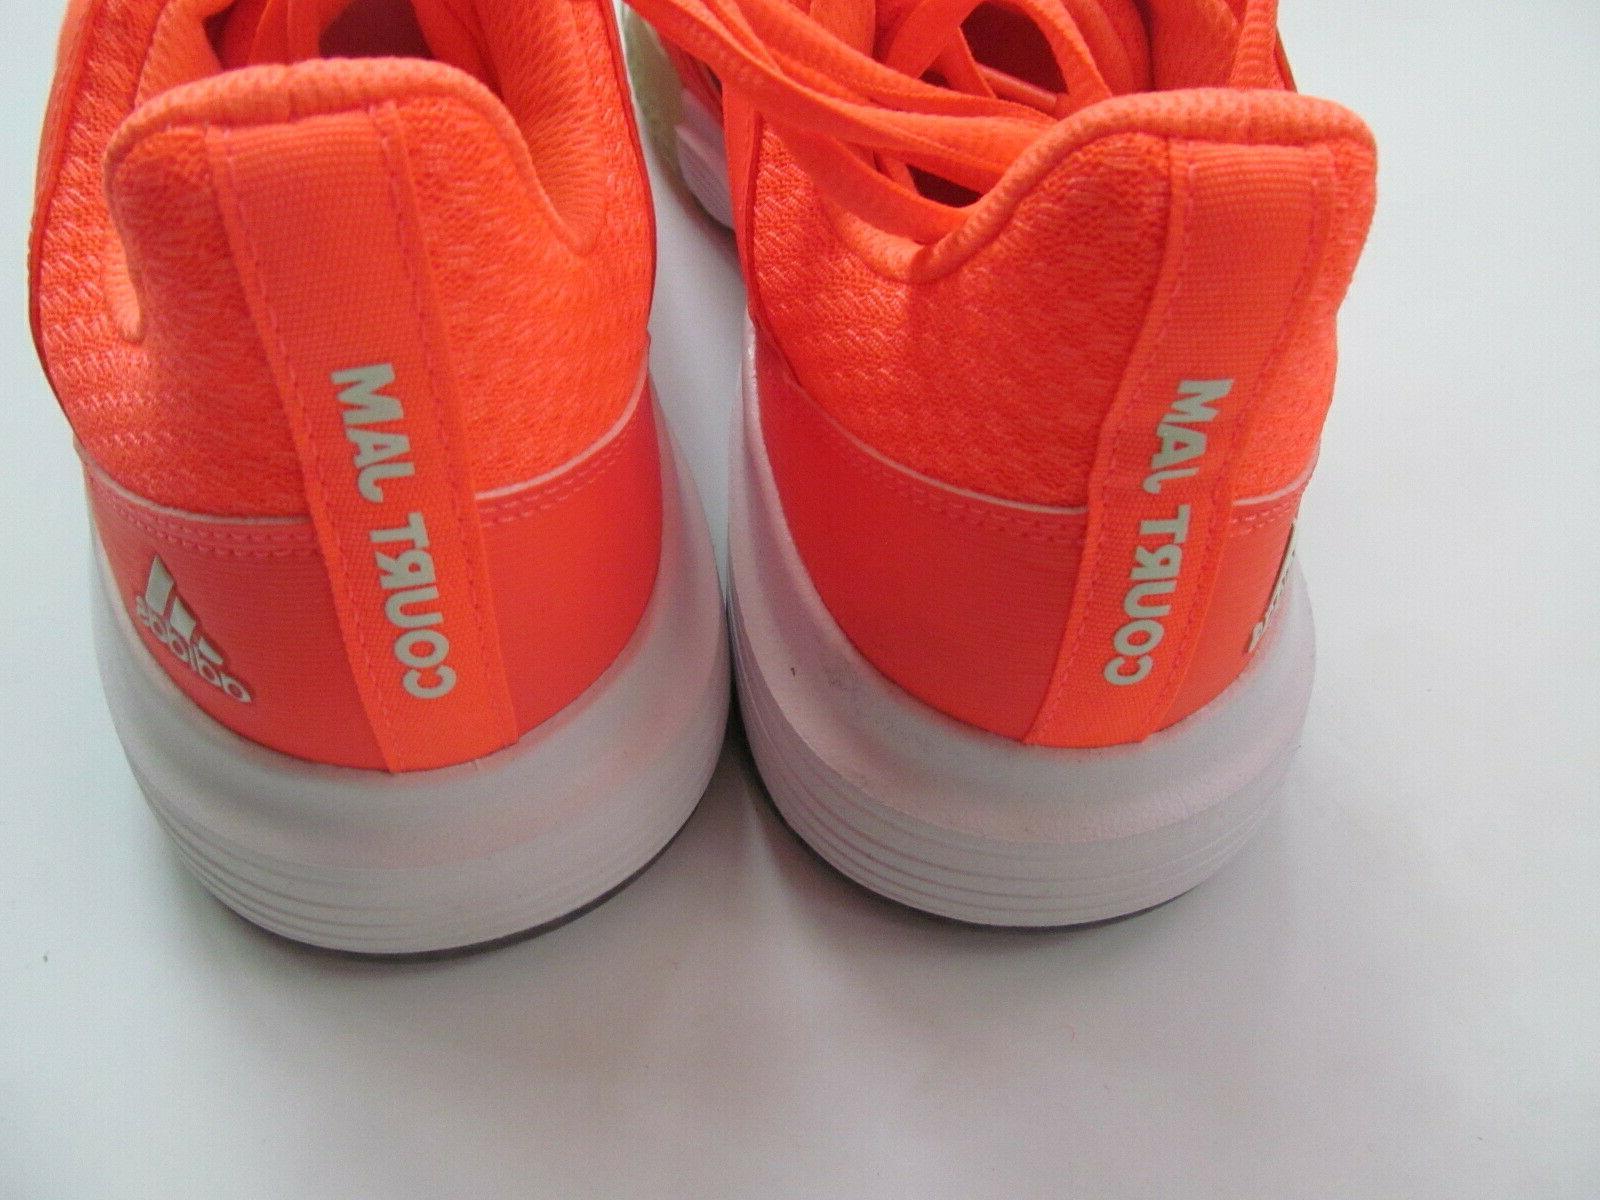 Adidas Bounce Tennis EF2478 man orange 9.5 10